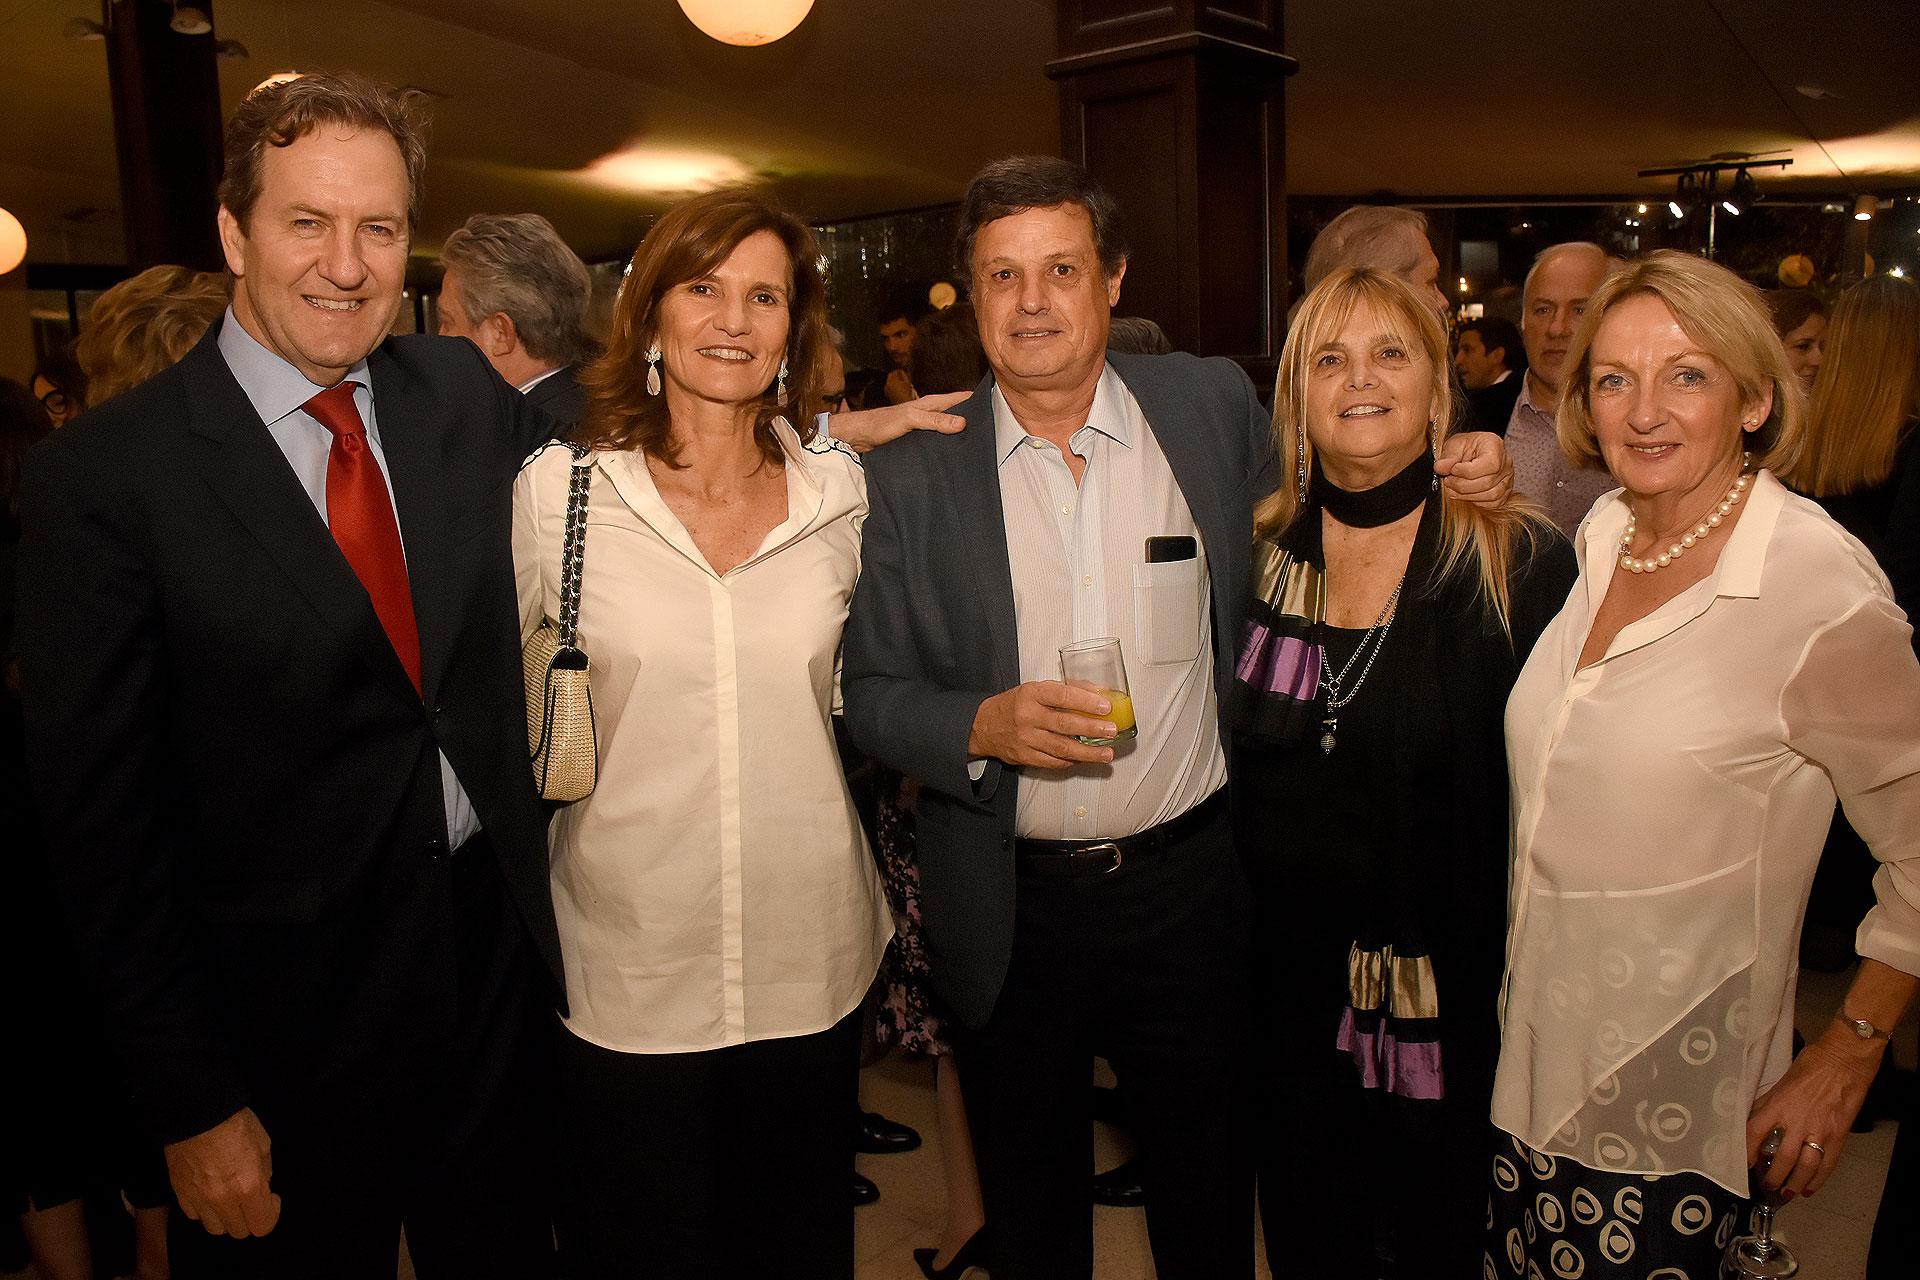 Sebastián y Laurenne Gurmendi; Mariano Grondona (h) y Paula Correa; y Katrina Gibb Stuart